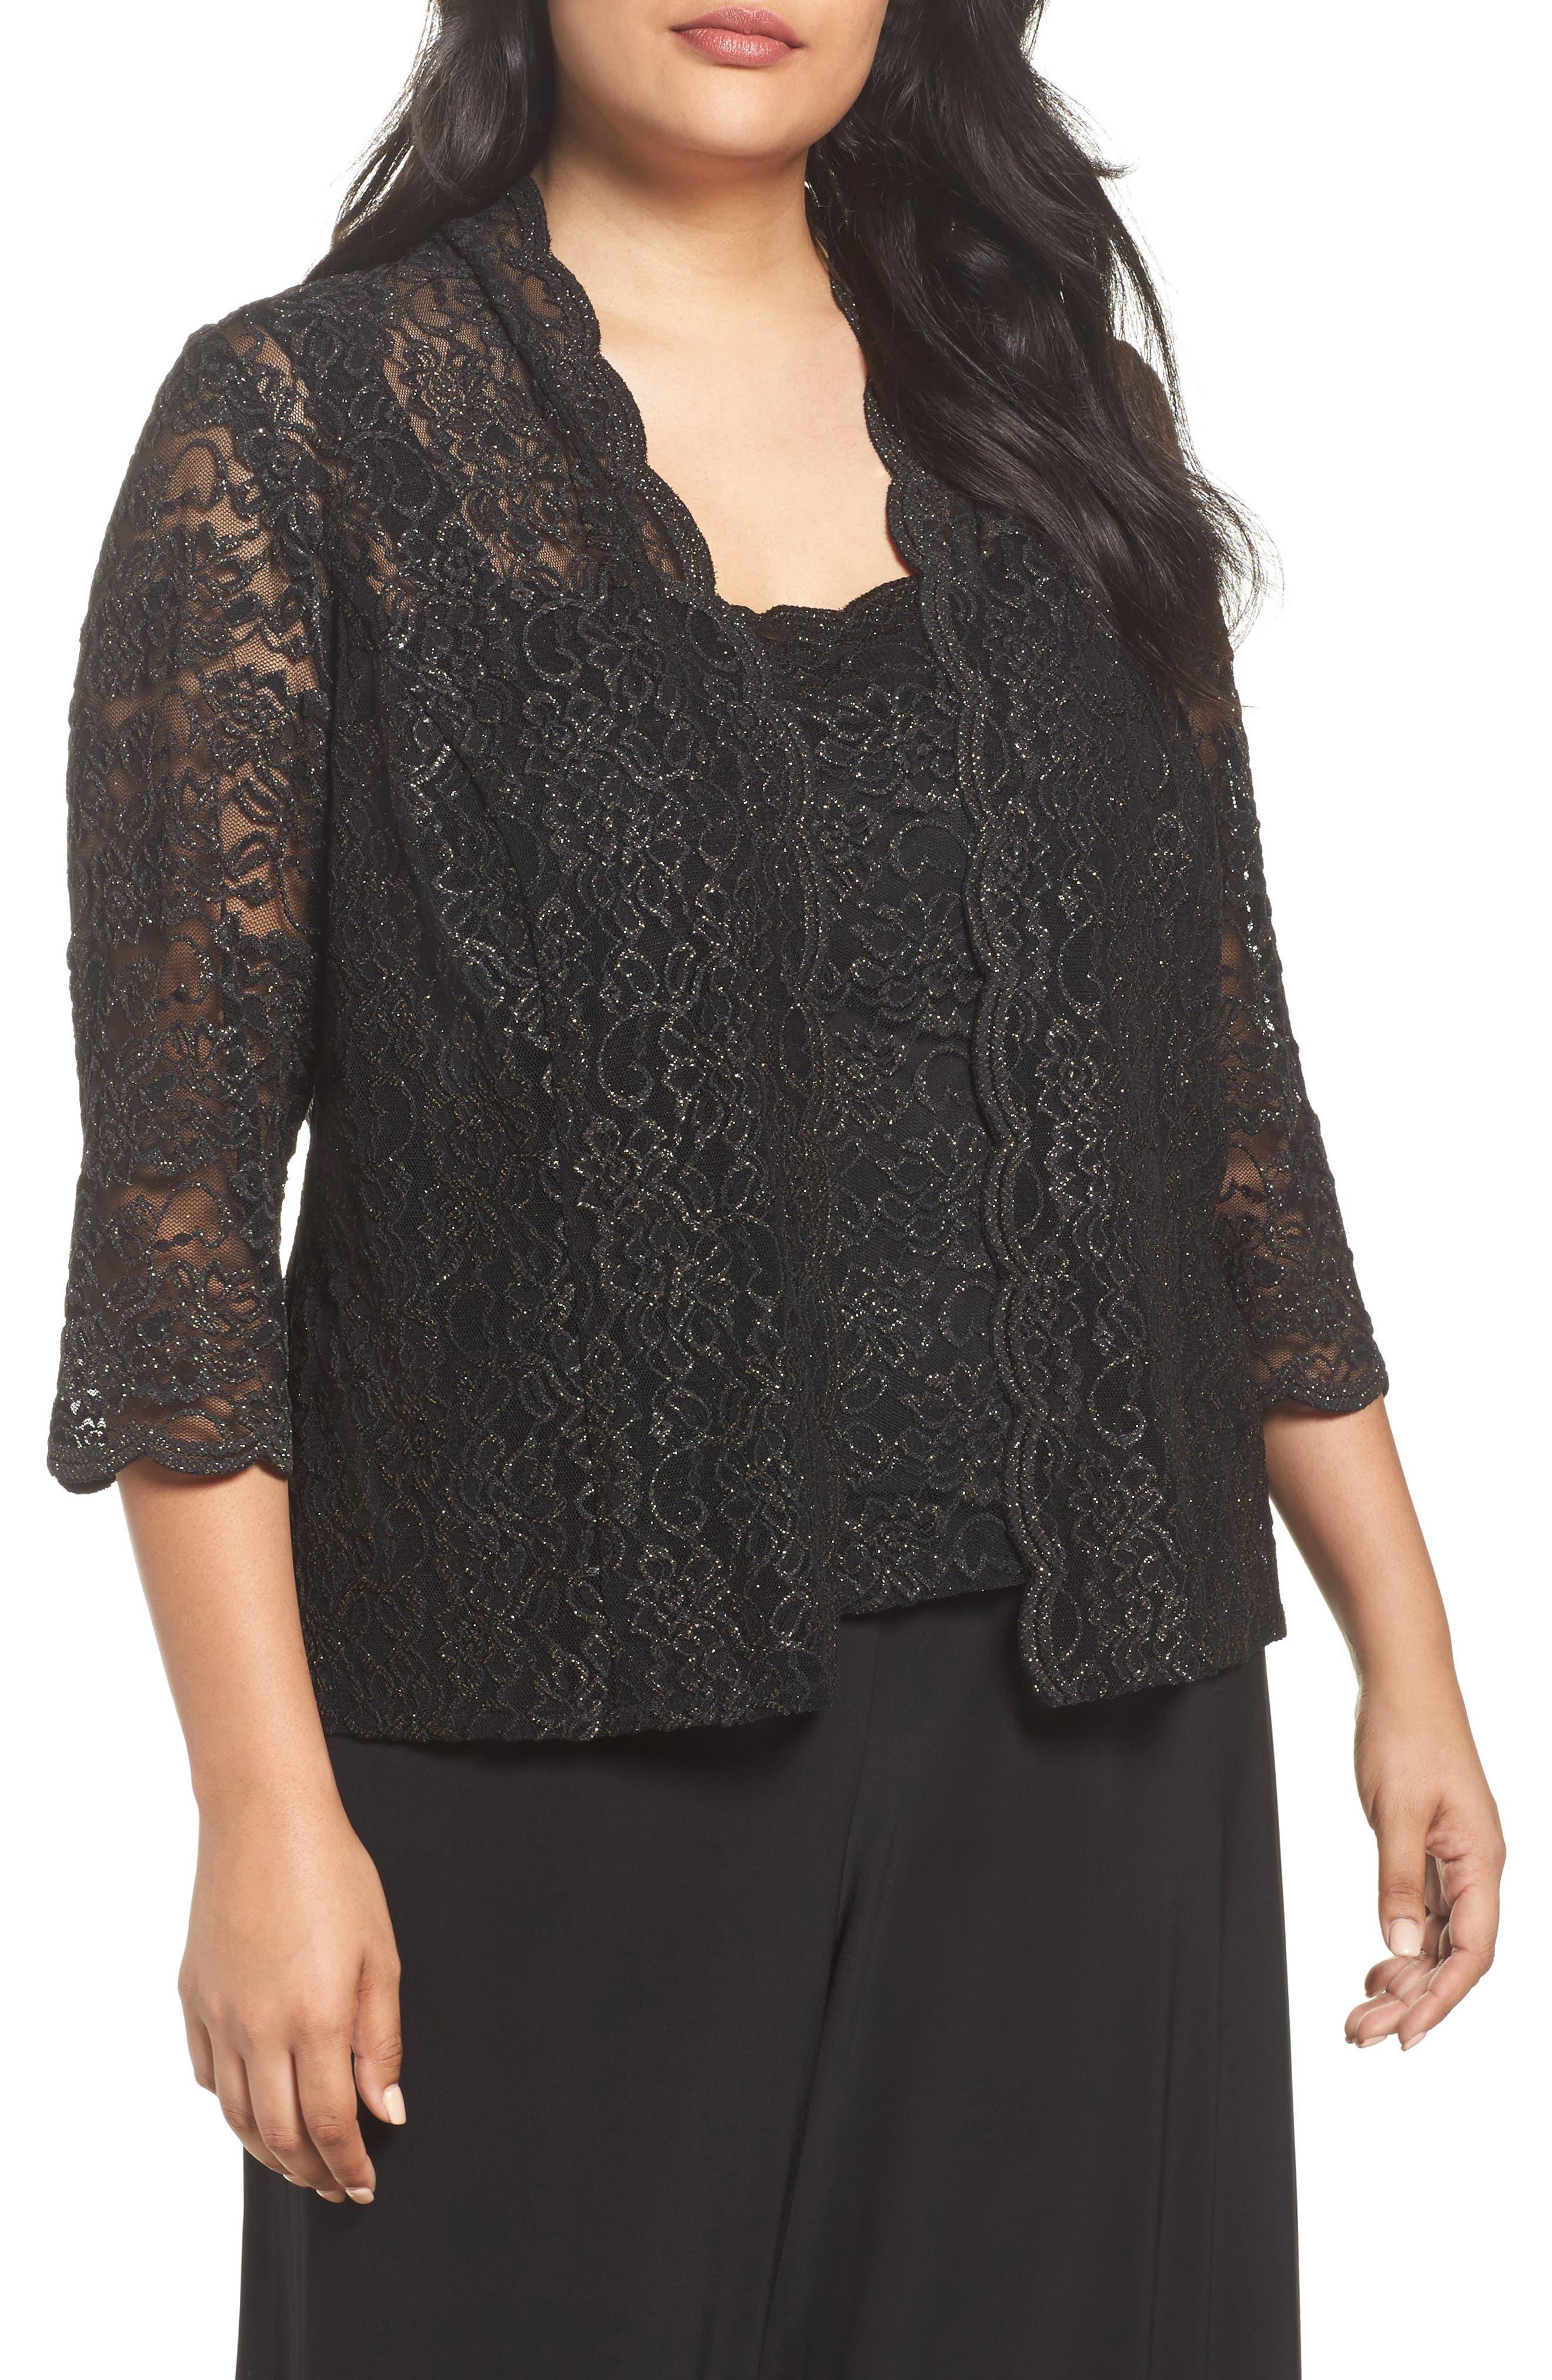 Sequin Lace Twinset,                         Main,                         color, Black/ Gold